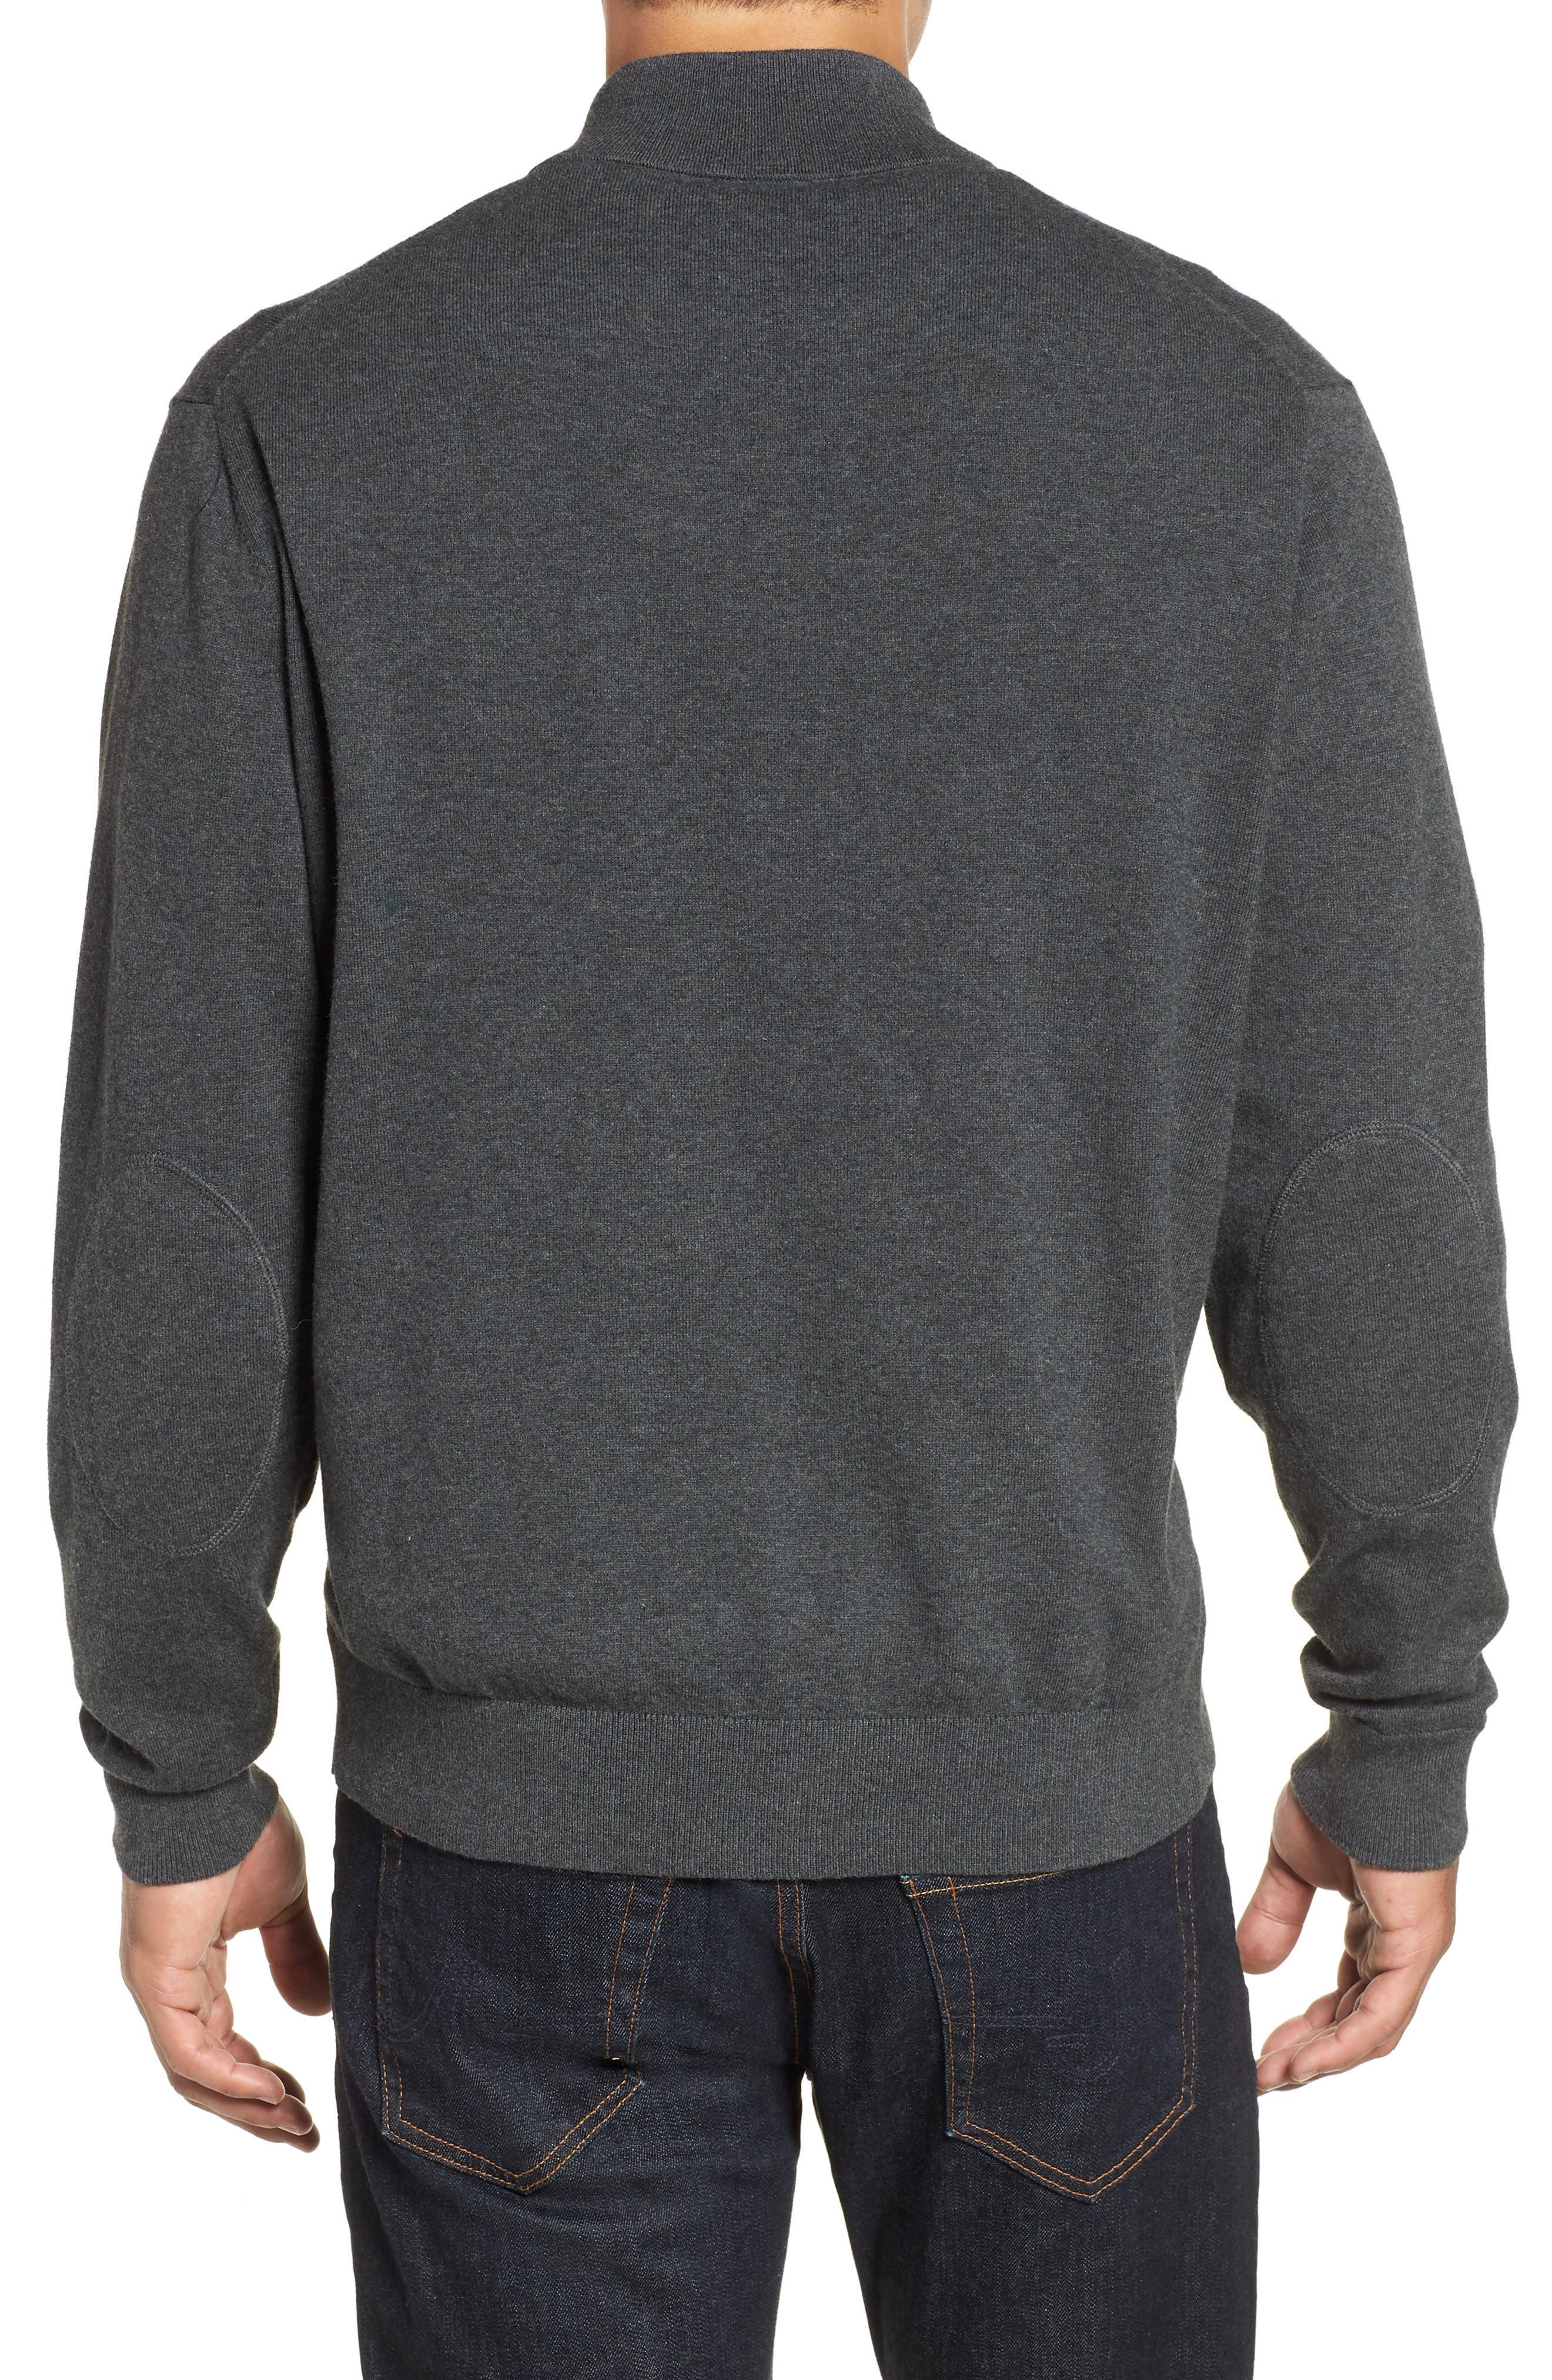 Los Angeles Rams - Lakemont Regular Fit Quarter Zip Sweater,                             Alternate thumbnail 2, color,                             CHARCOAL HEATHER